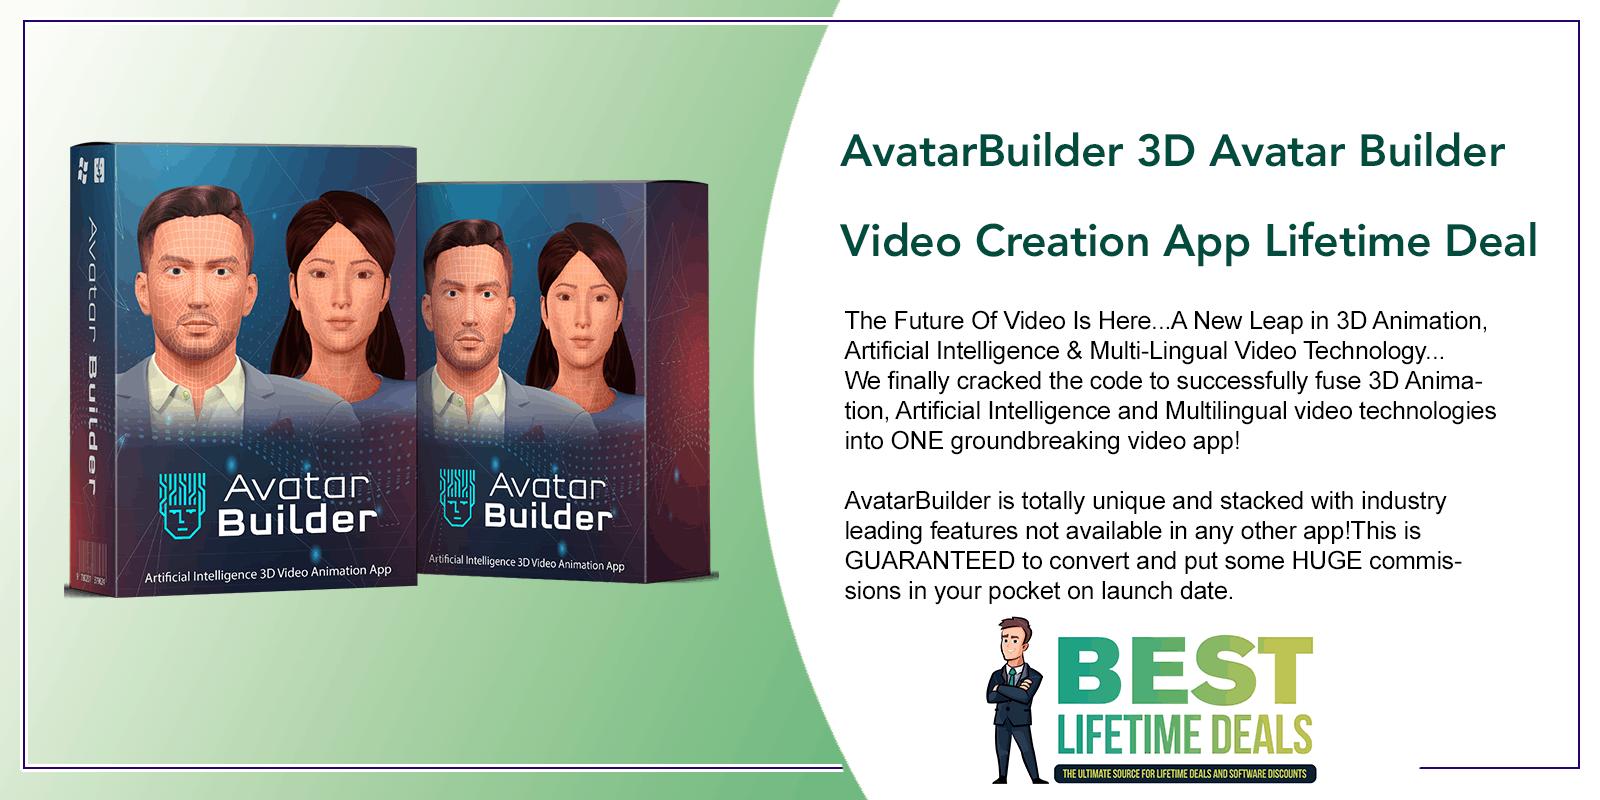 AvatarBuilder 3D Avatar Builder Video Creation App Featured Image